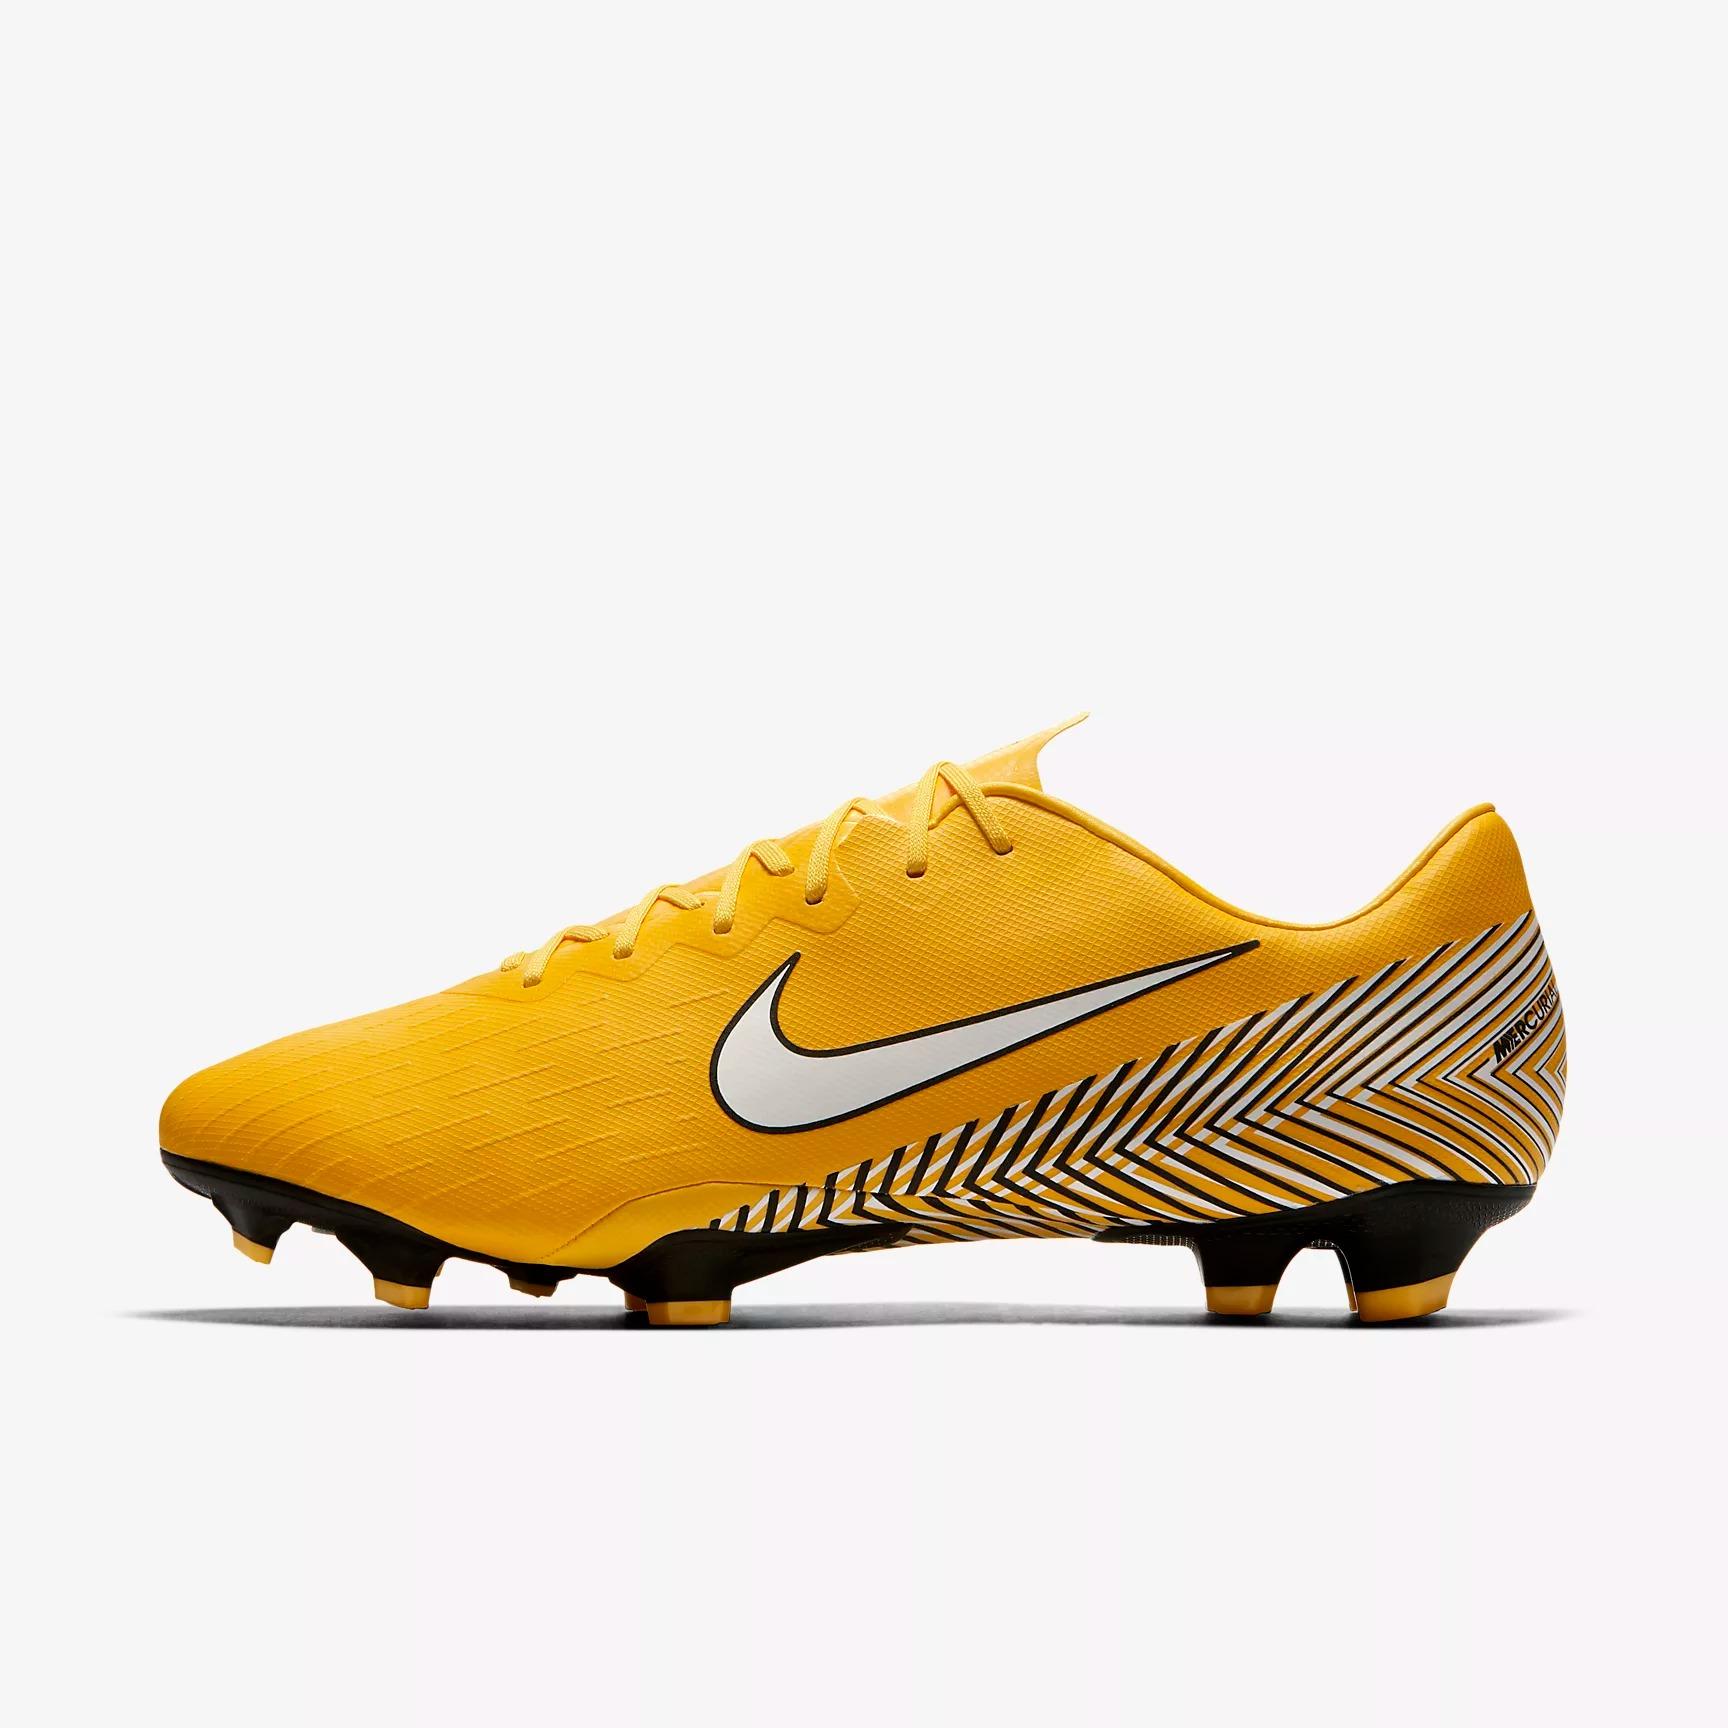 nike mercurial vapor xii pro neymar jr fg soccer cleats